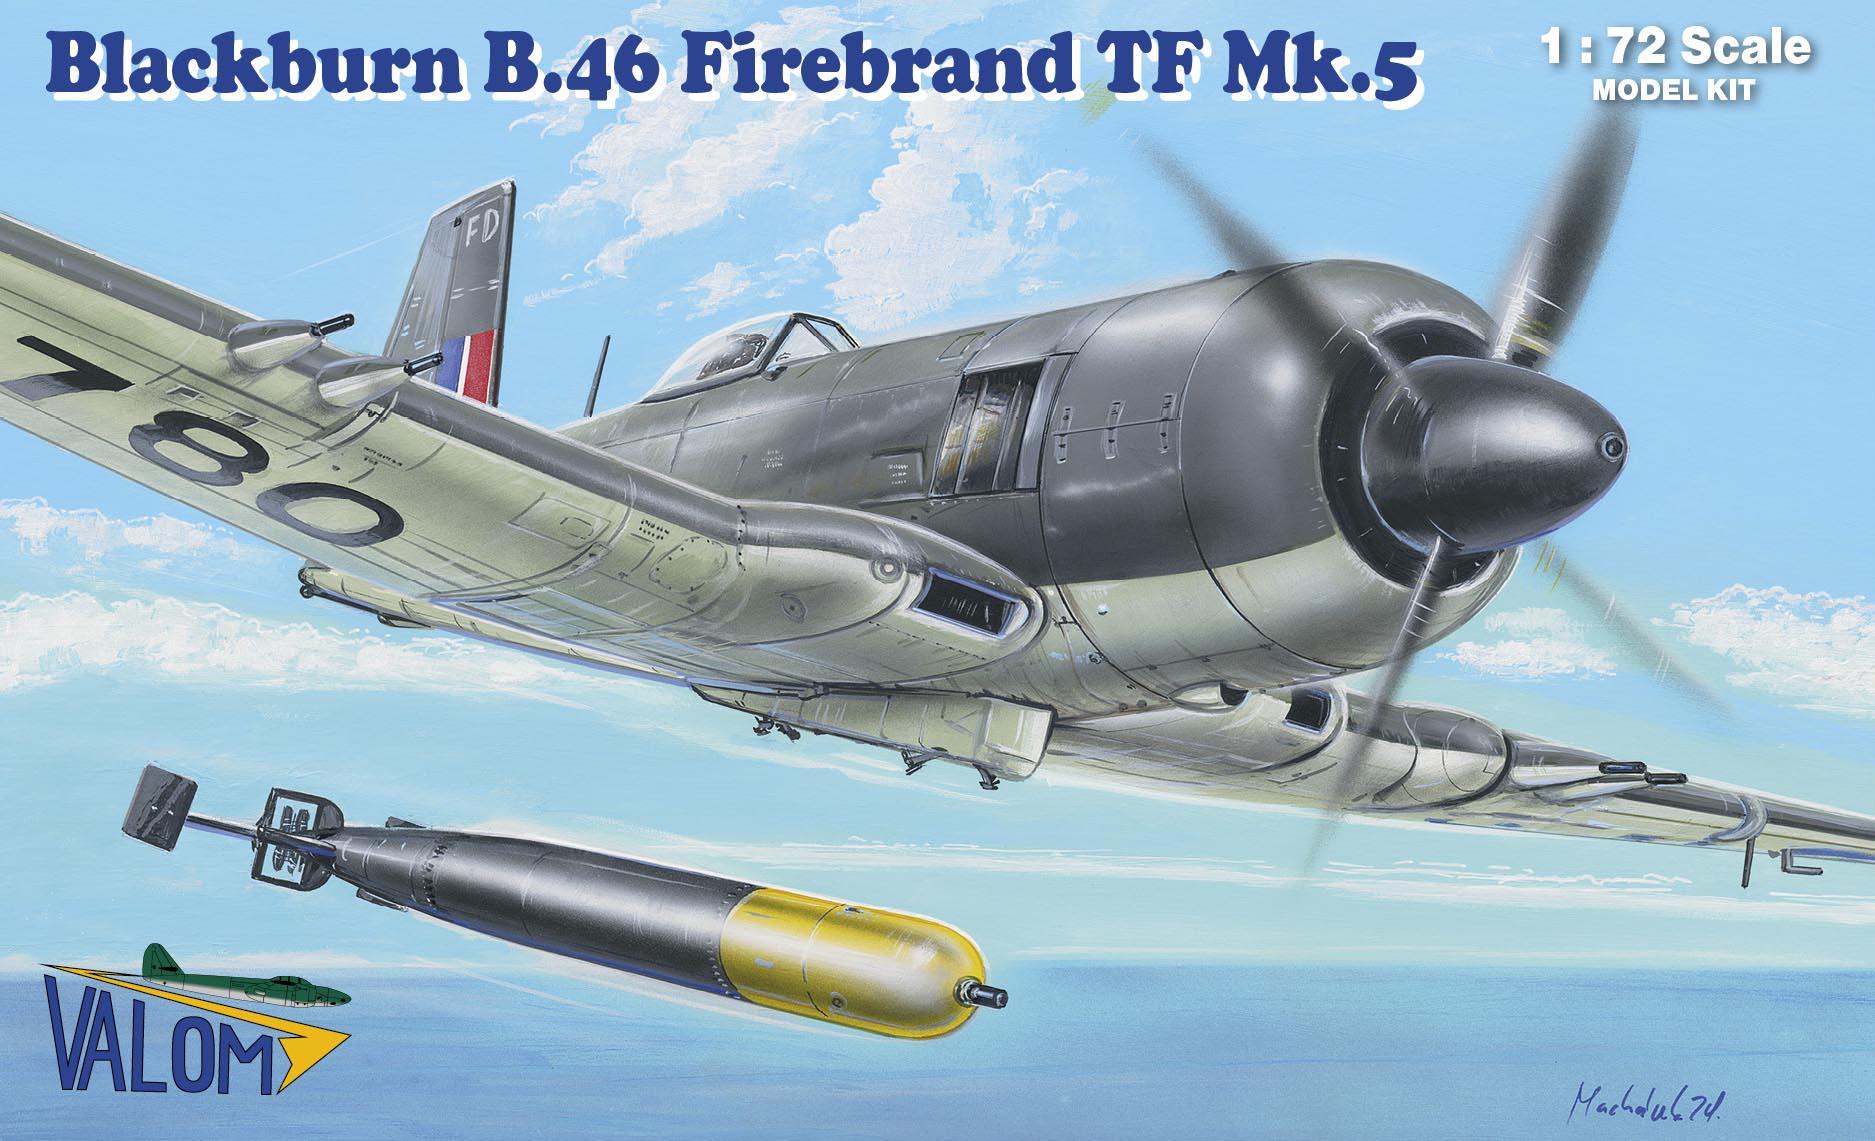 Valom Blackburn Firebrand TF.Mk.5